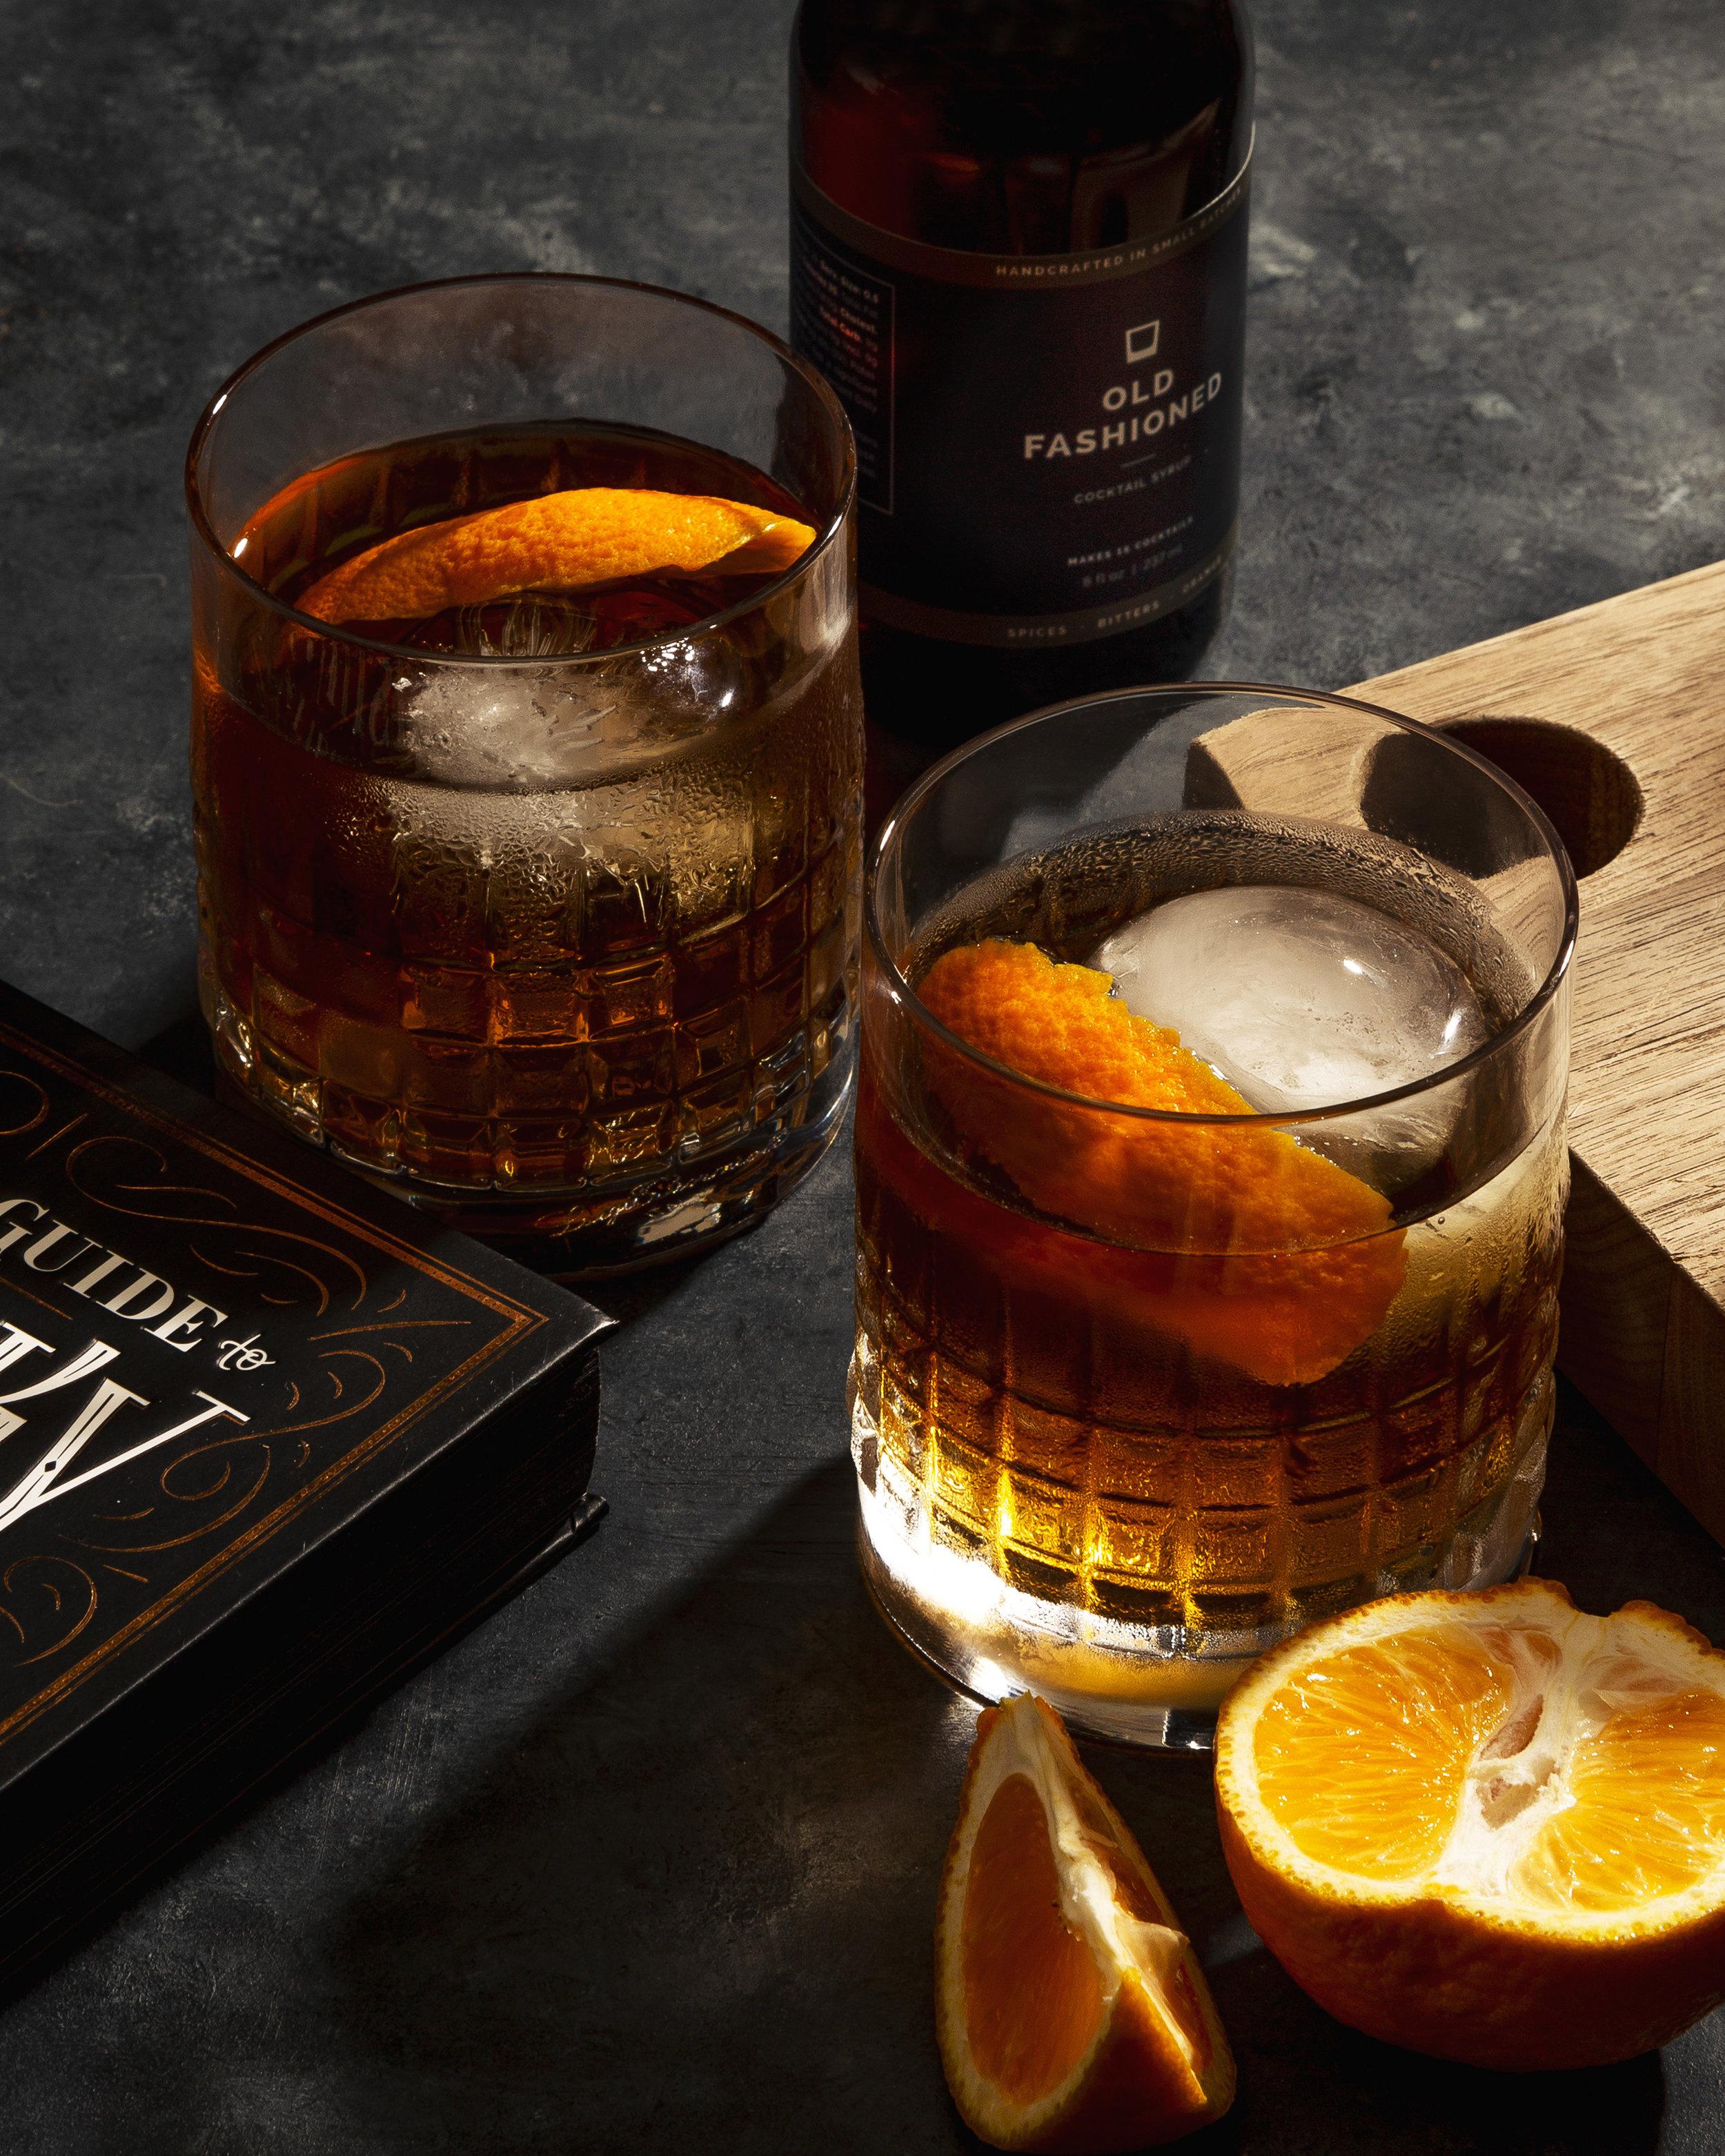 whiskey-cocktail-drinks-bar-matthew-kashtan.jpg